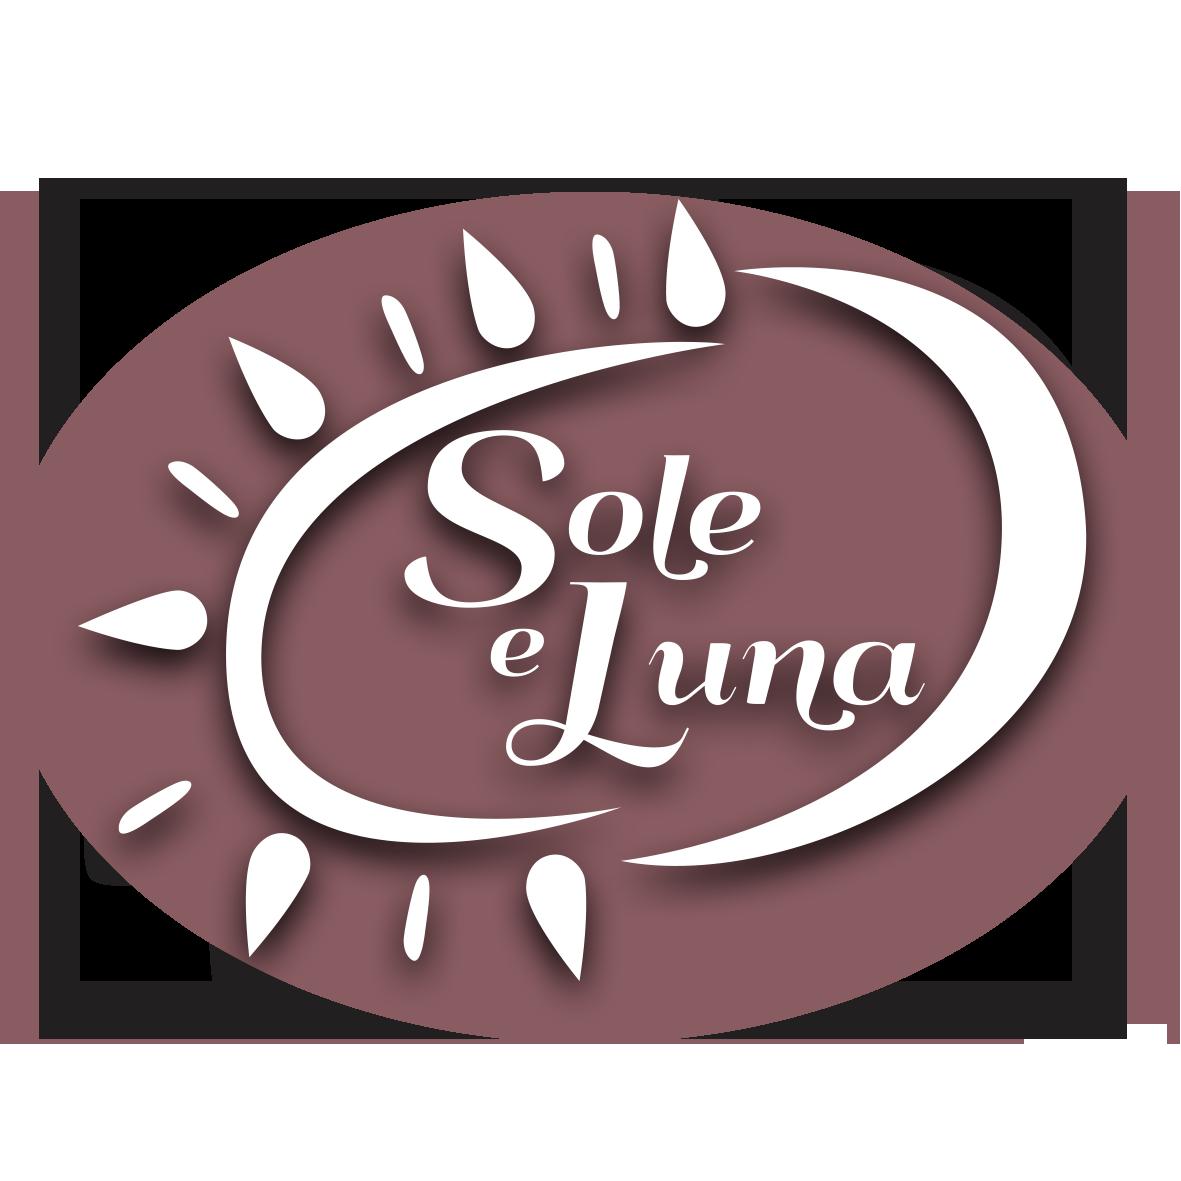 Sole e Luna - Dimagrimento e Laser a Diodo